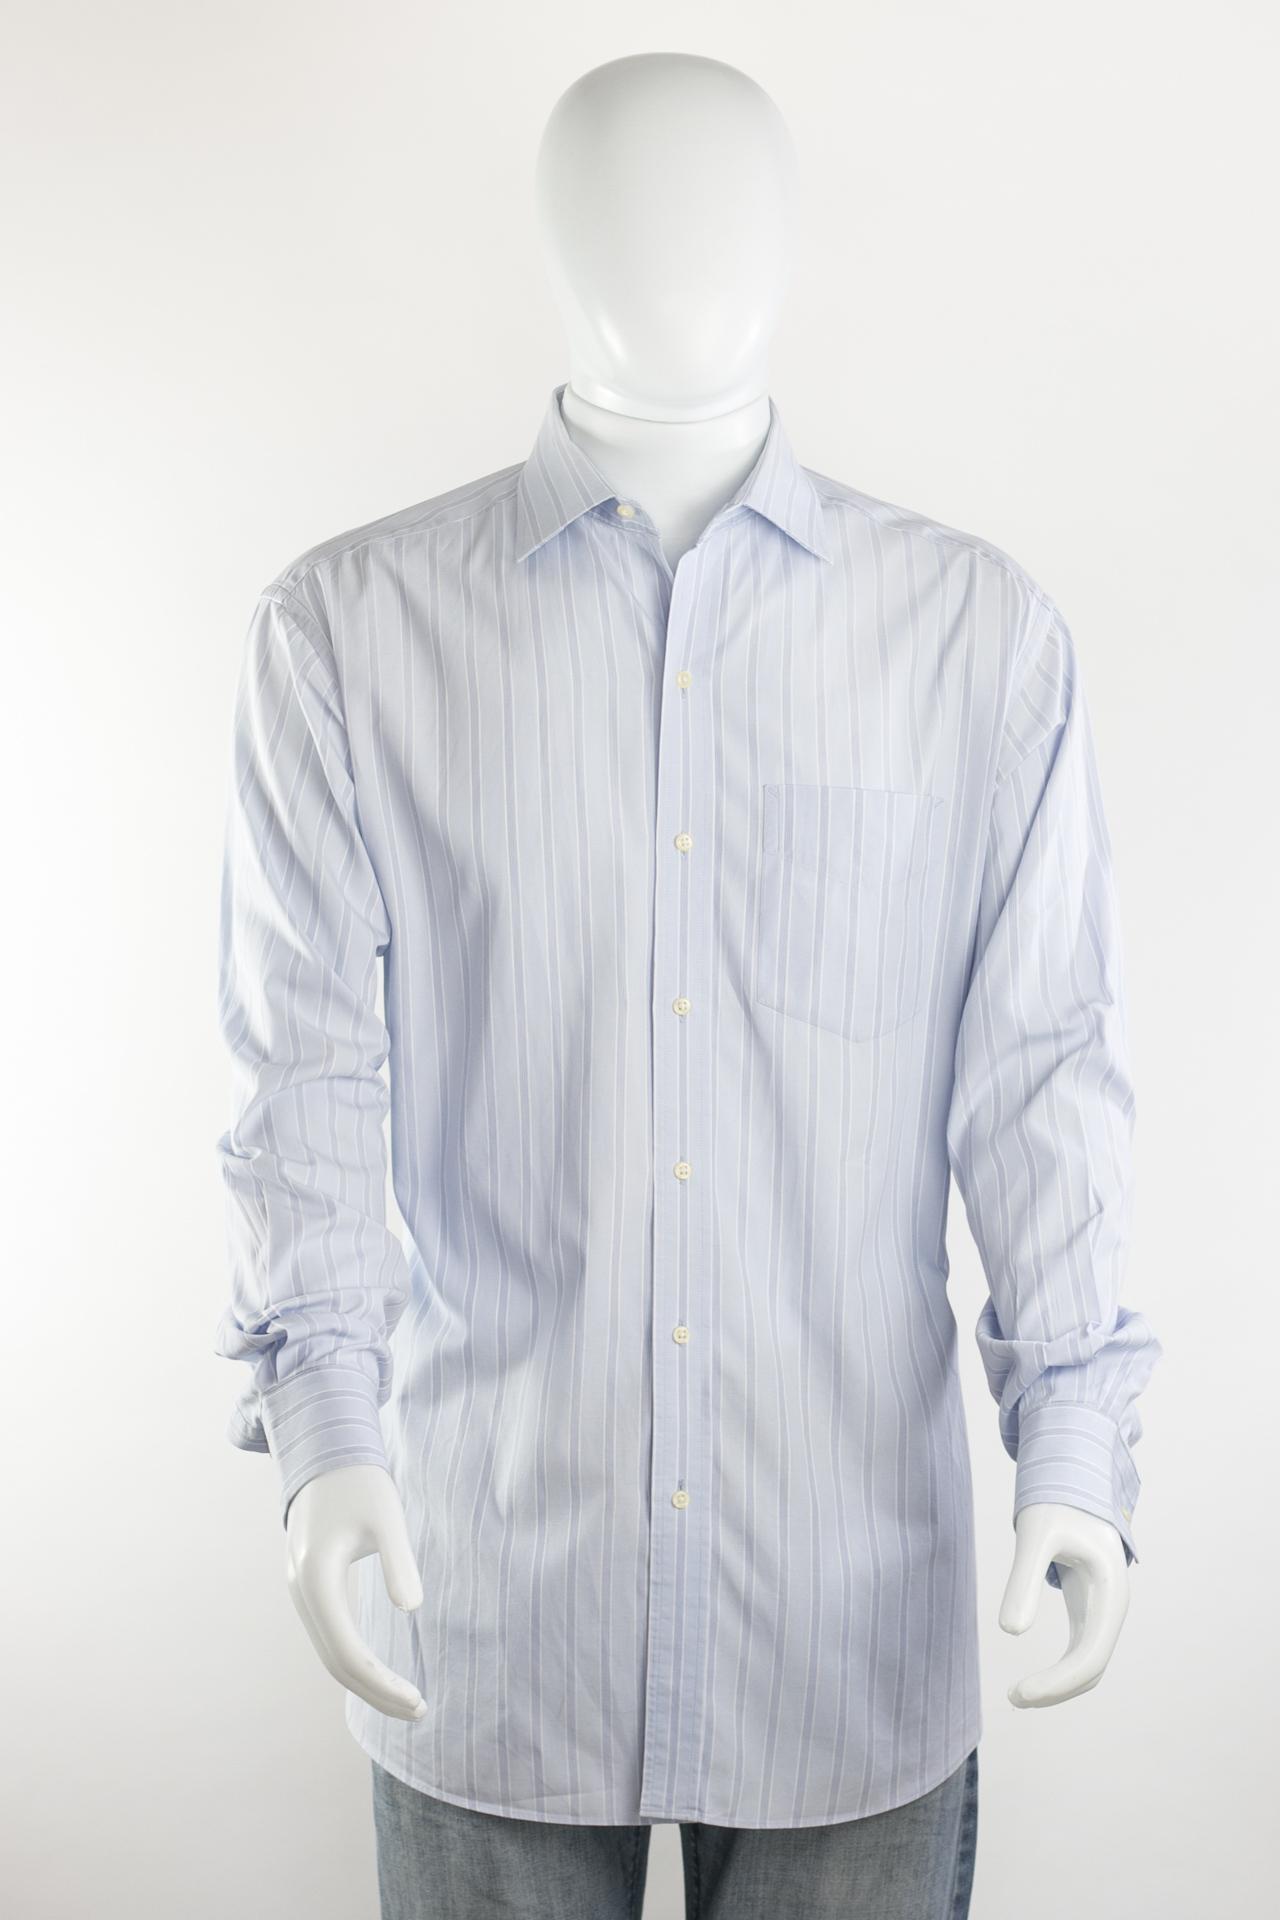 a97bd2a6b23 TOMMY HILFIGER - Camisa masculina azul listrada - Brechó Agora é Meu!